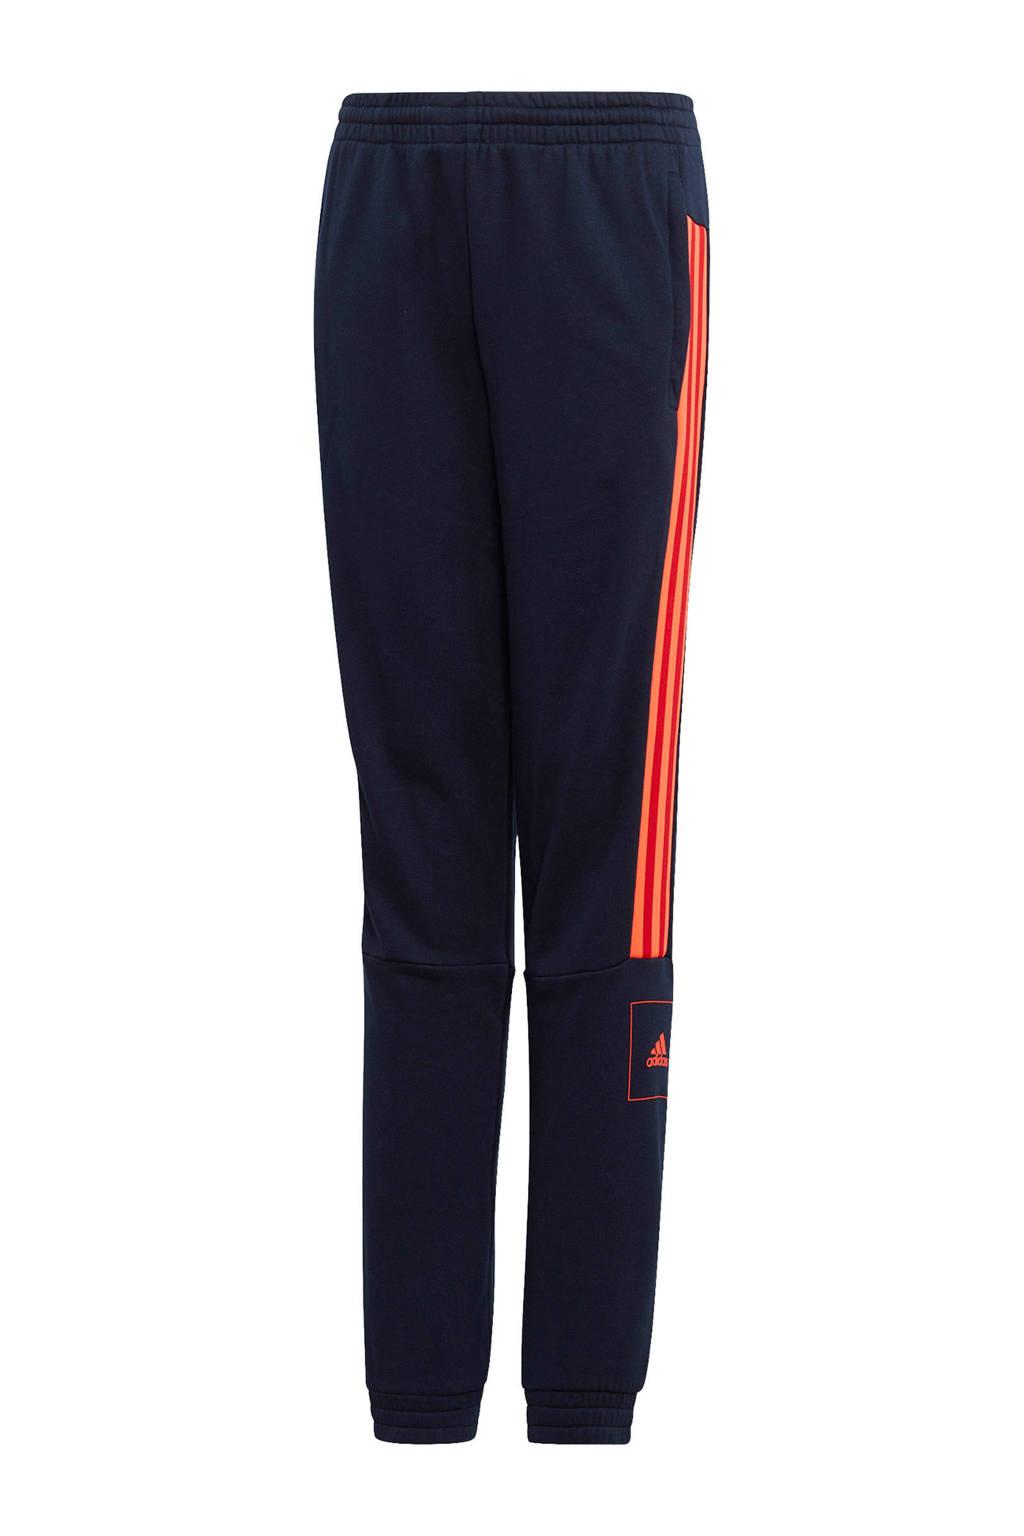 adidas   sportbroek donkerblauw/rood, Donkerblauw/rood